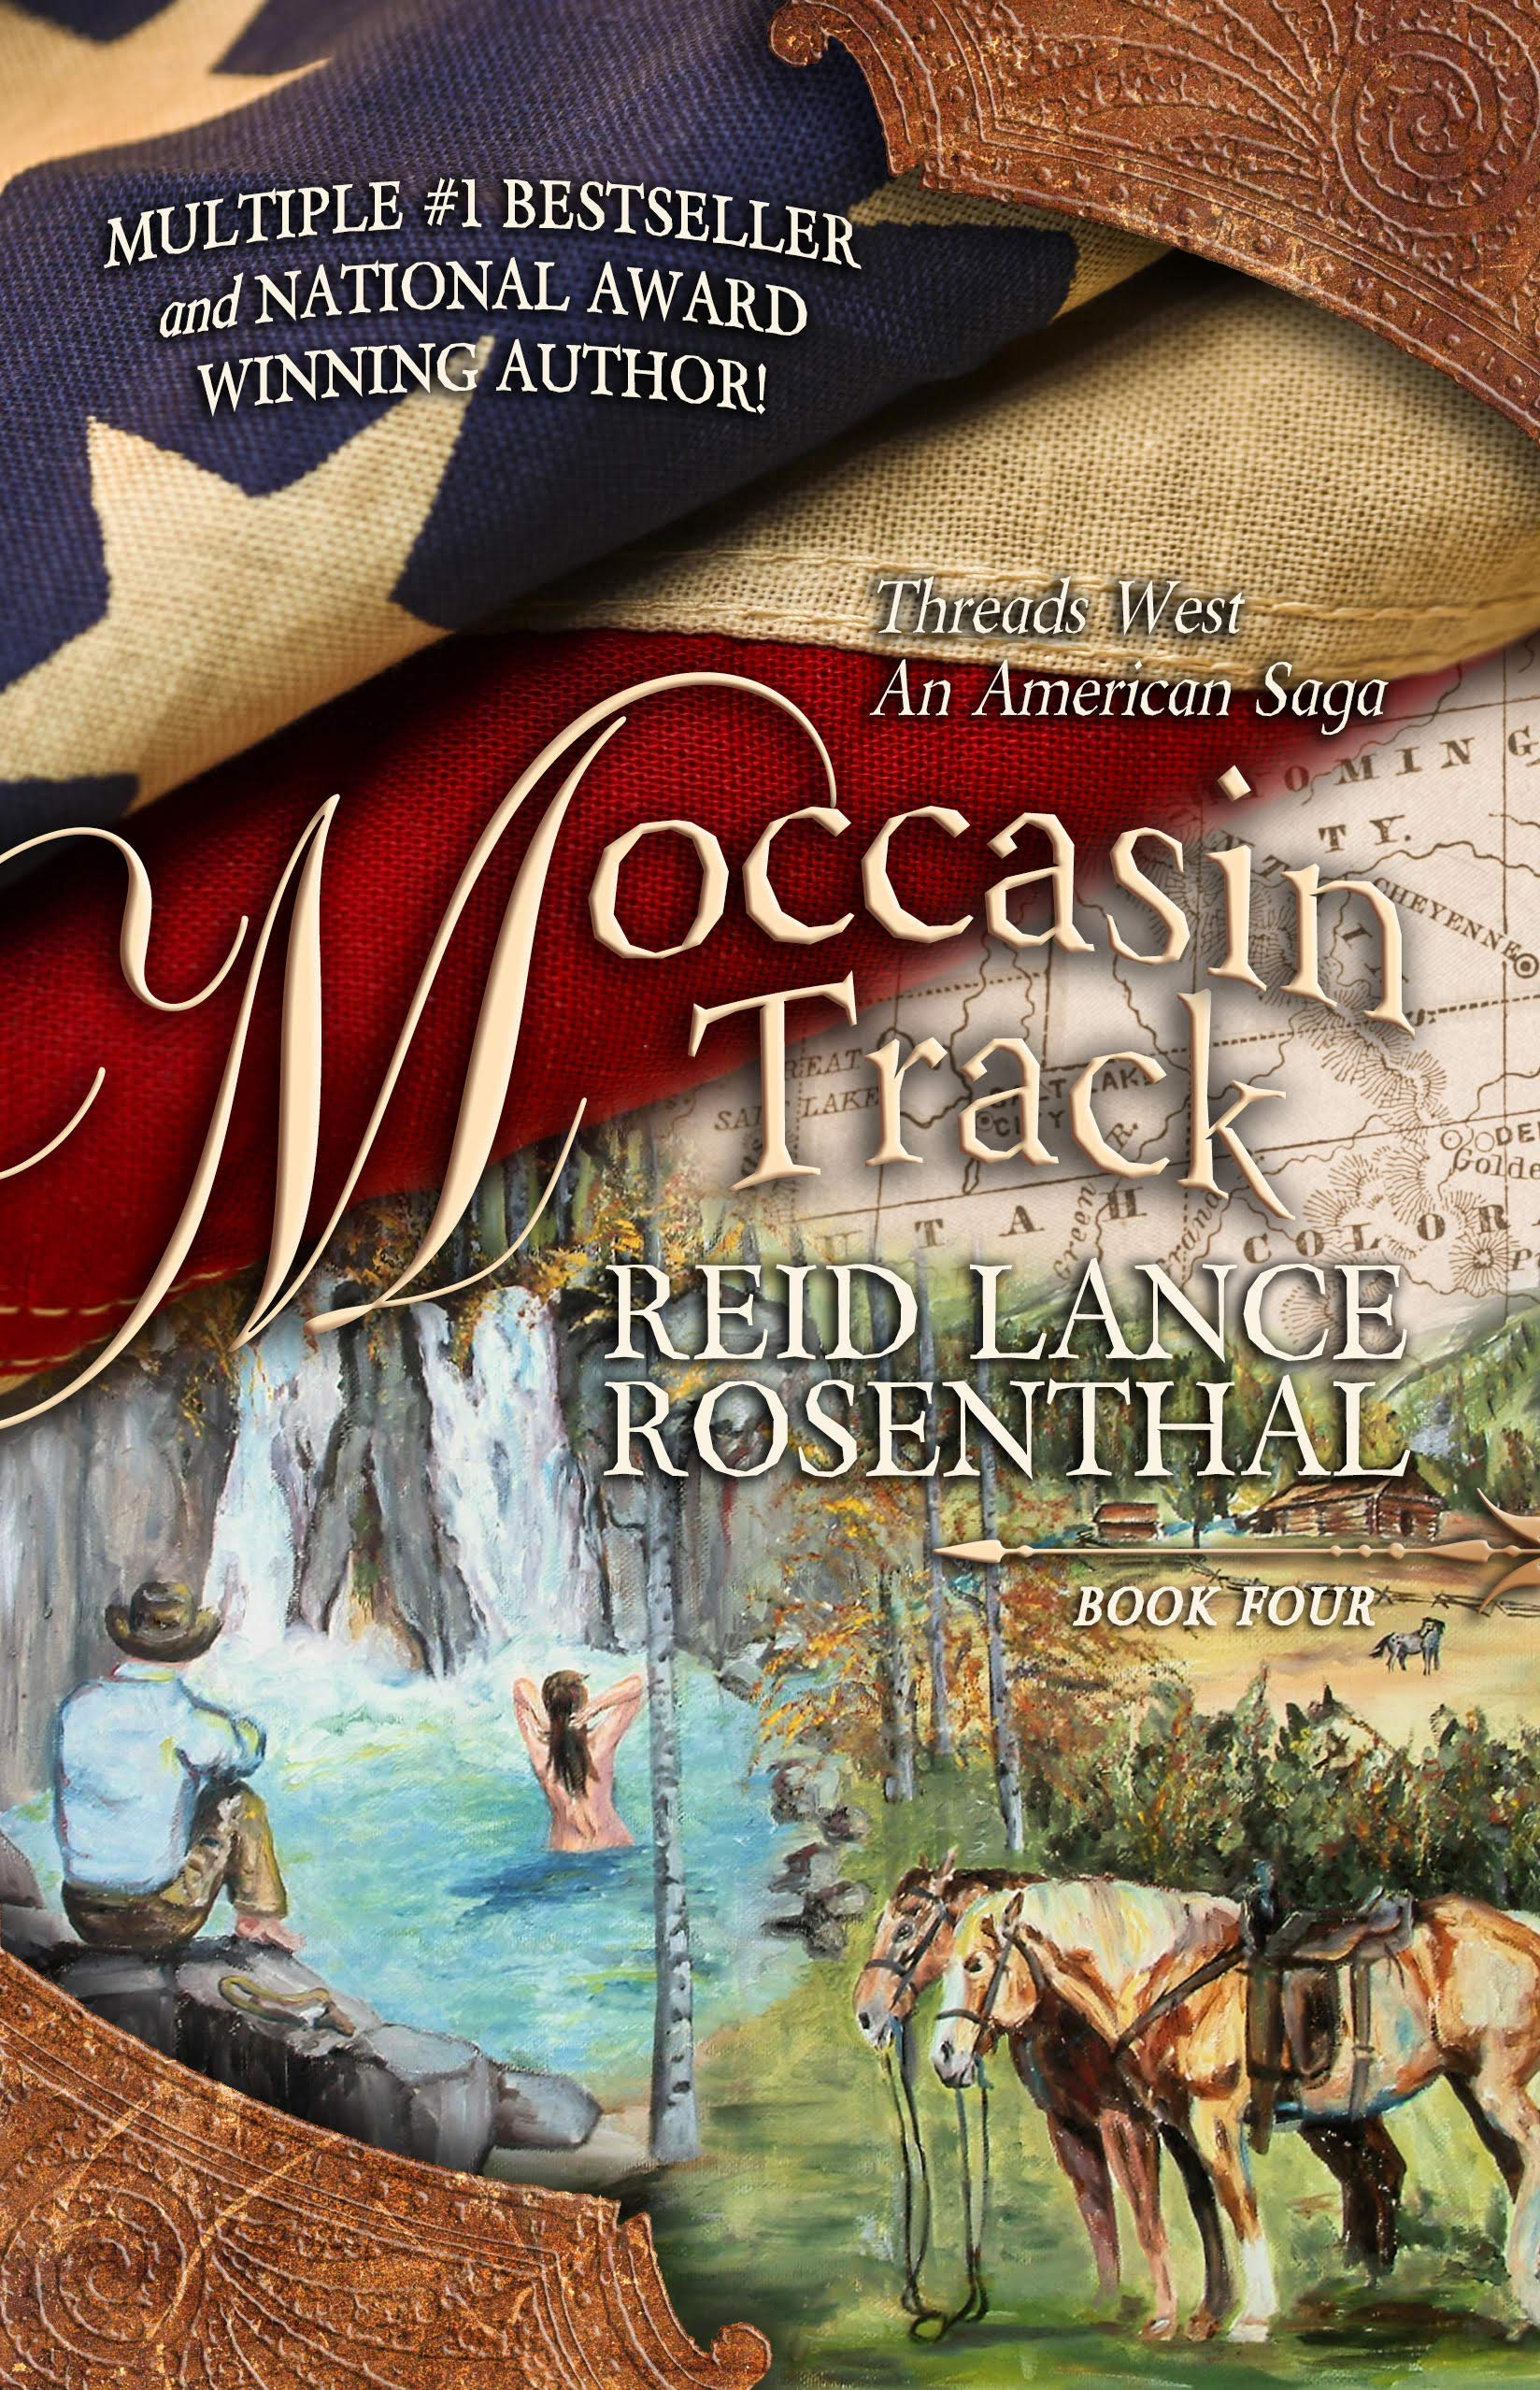 Moccasin Tracks: Reid Lance Rosenthal: 9780982157640: Books